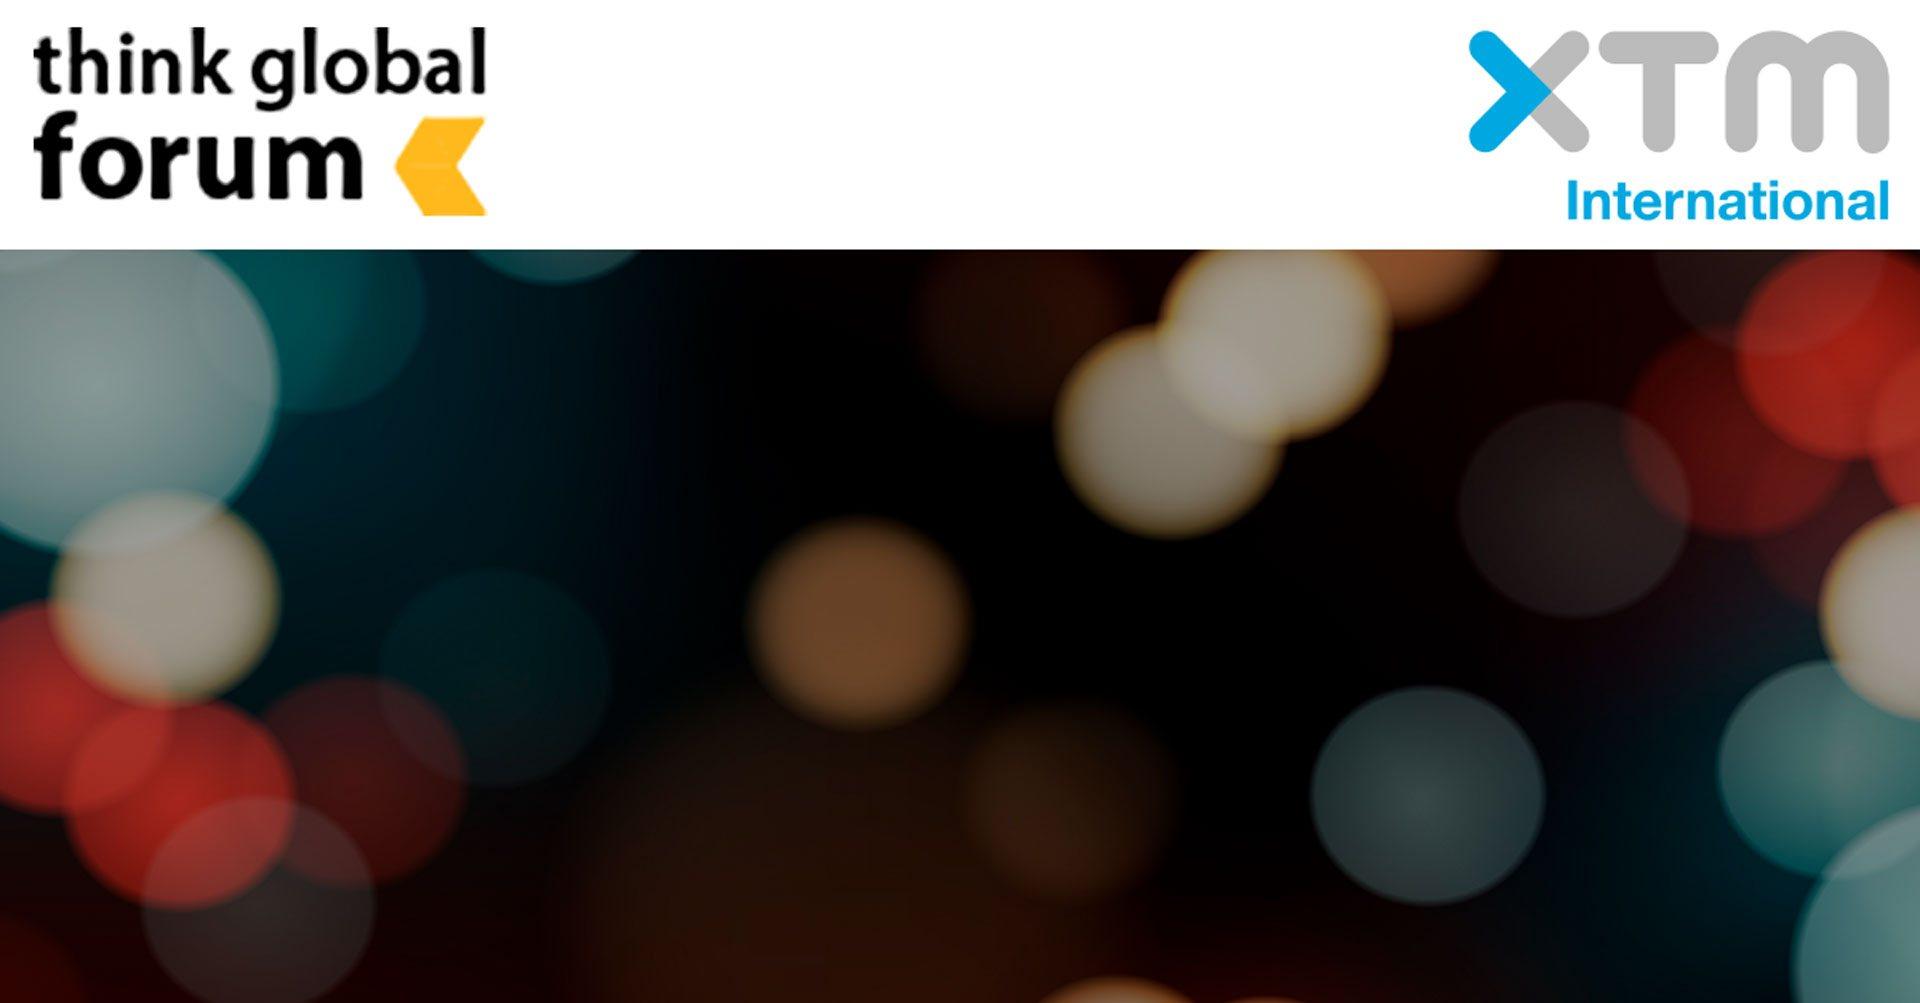 XTM International win Think Global Forum Award